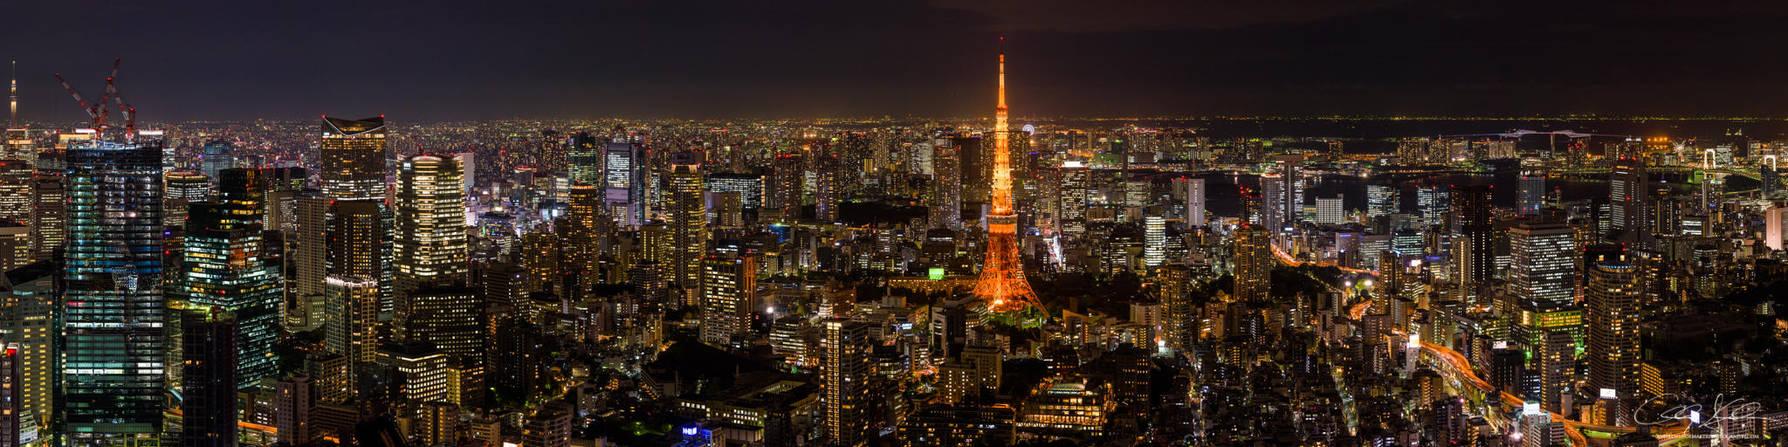 Tokyo Skyline by AndrewShoemaker